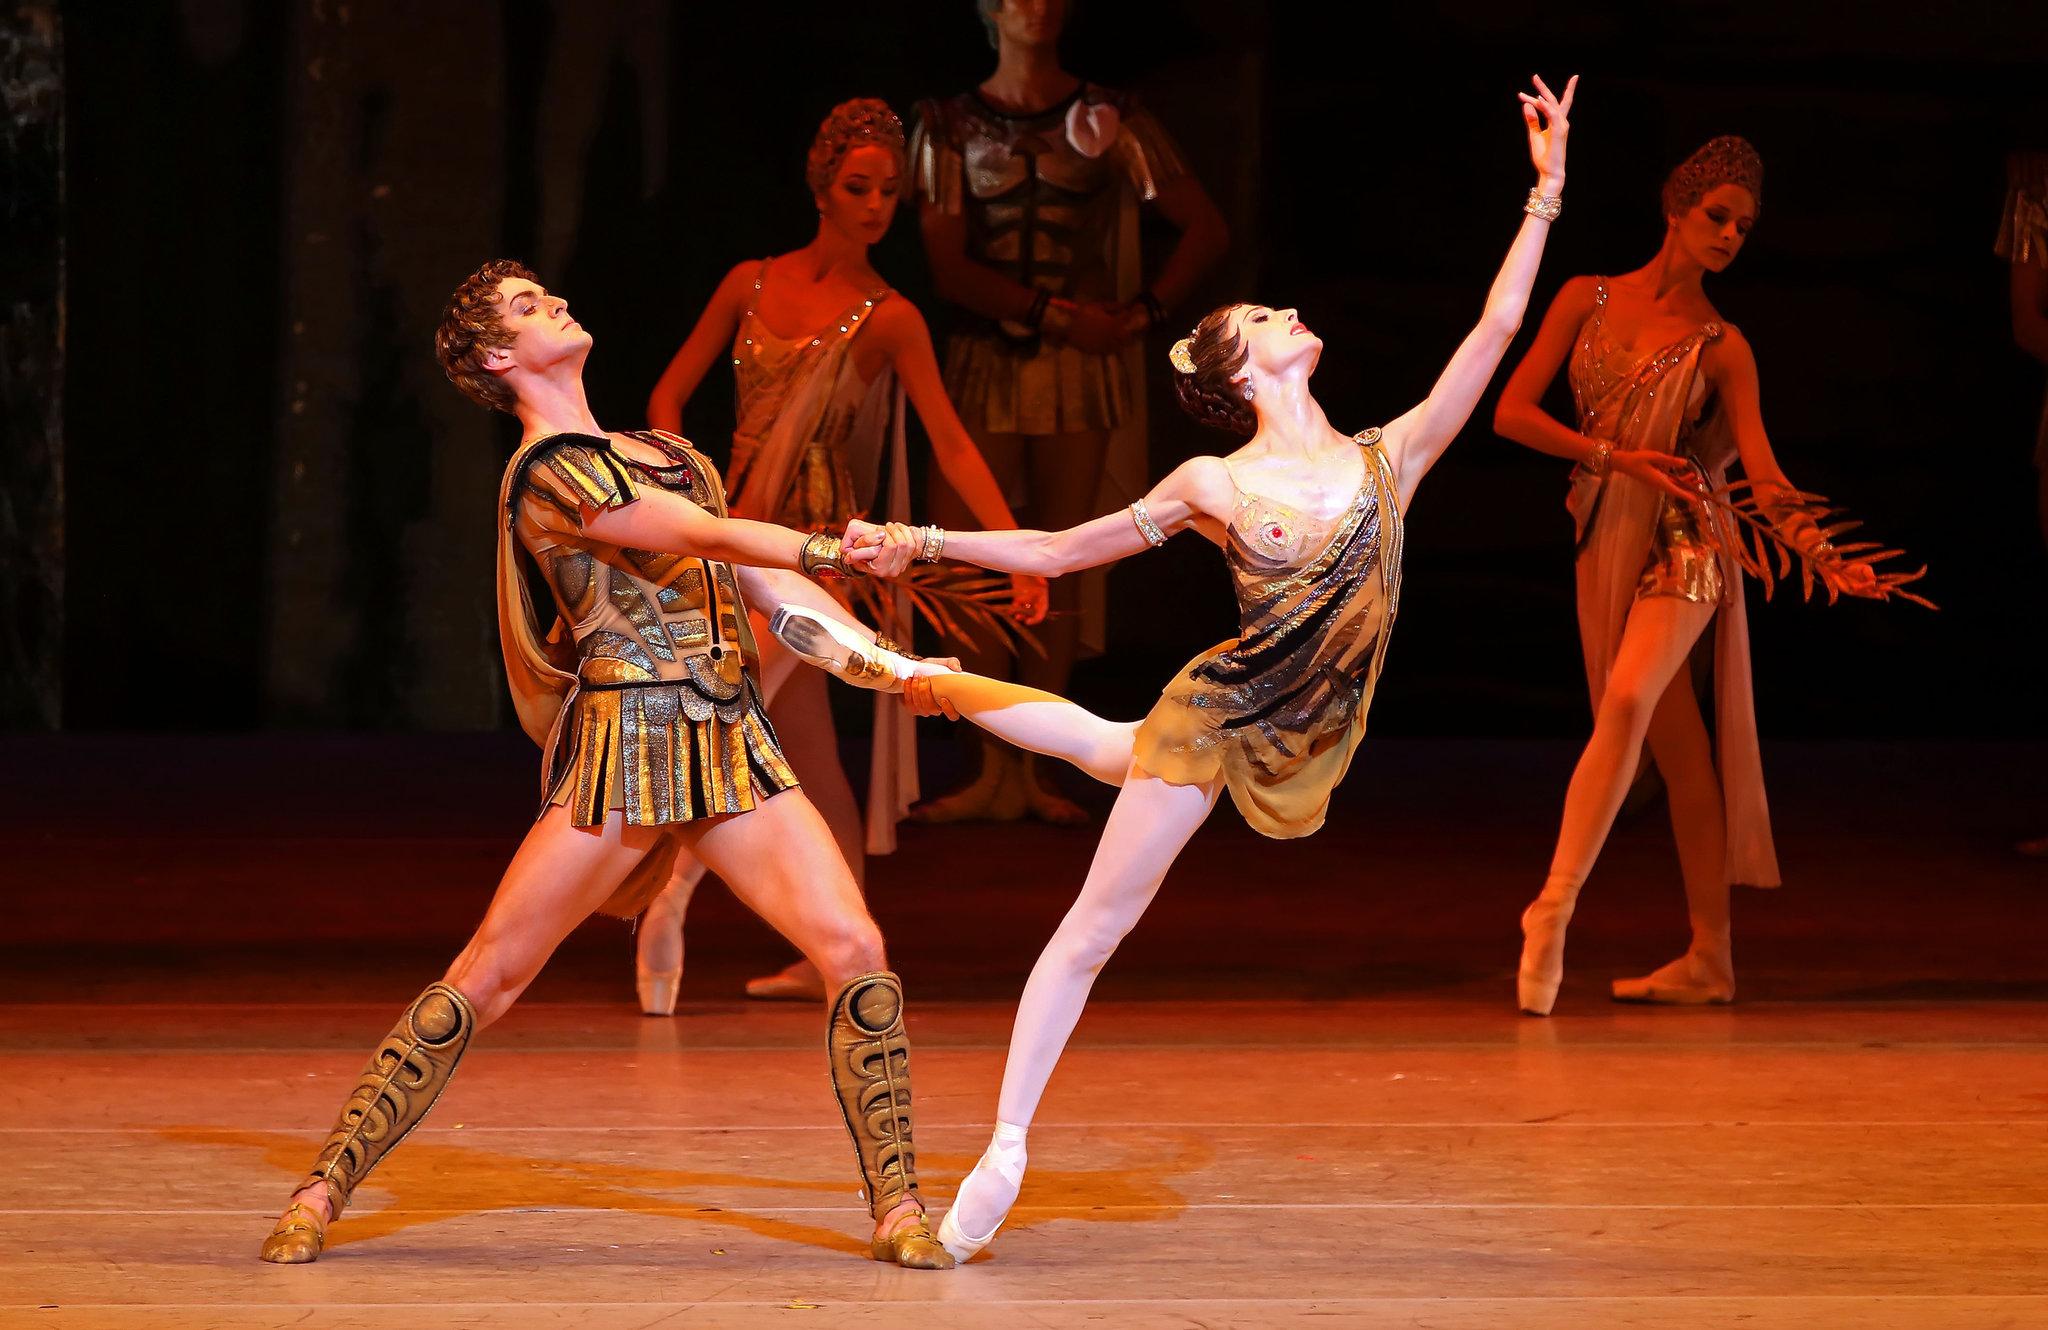 spartacus bolshoi at arena theater